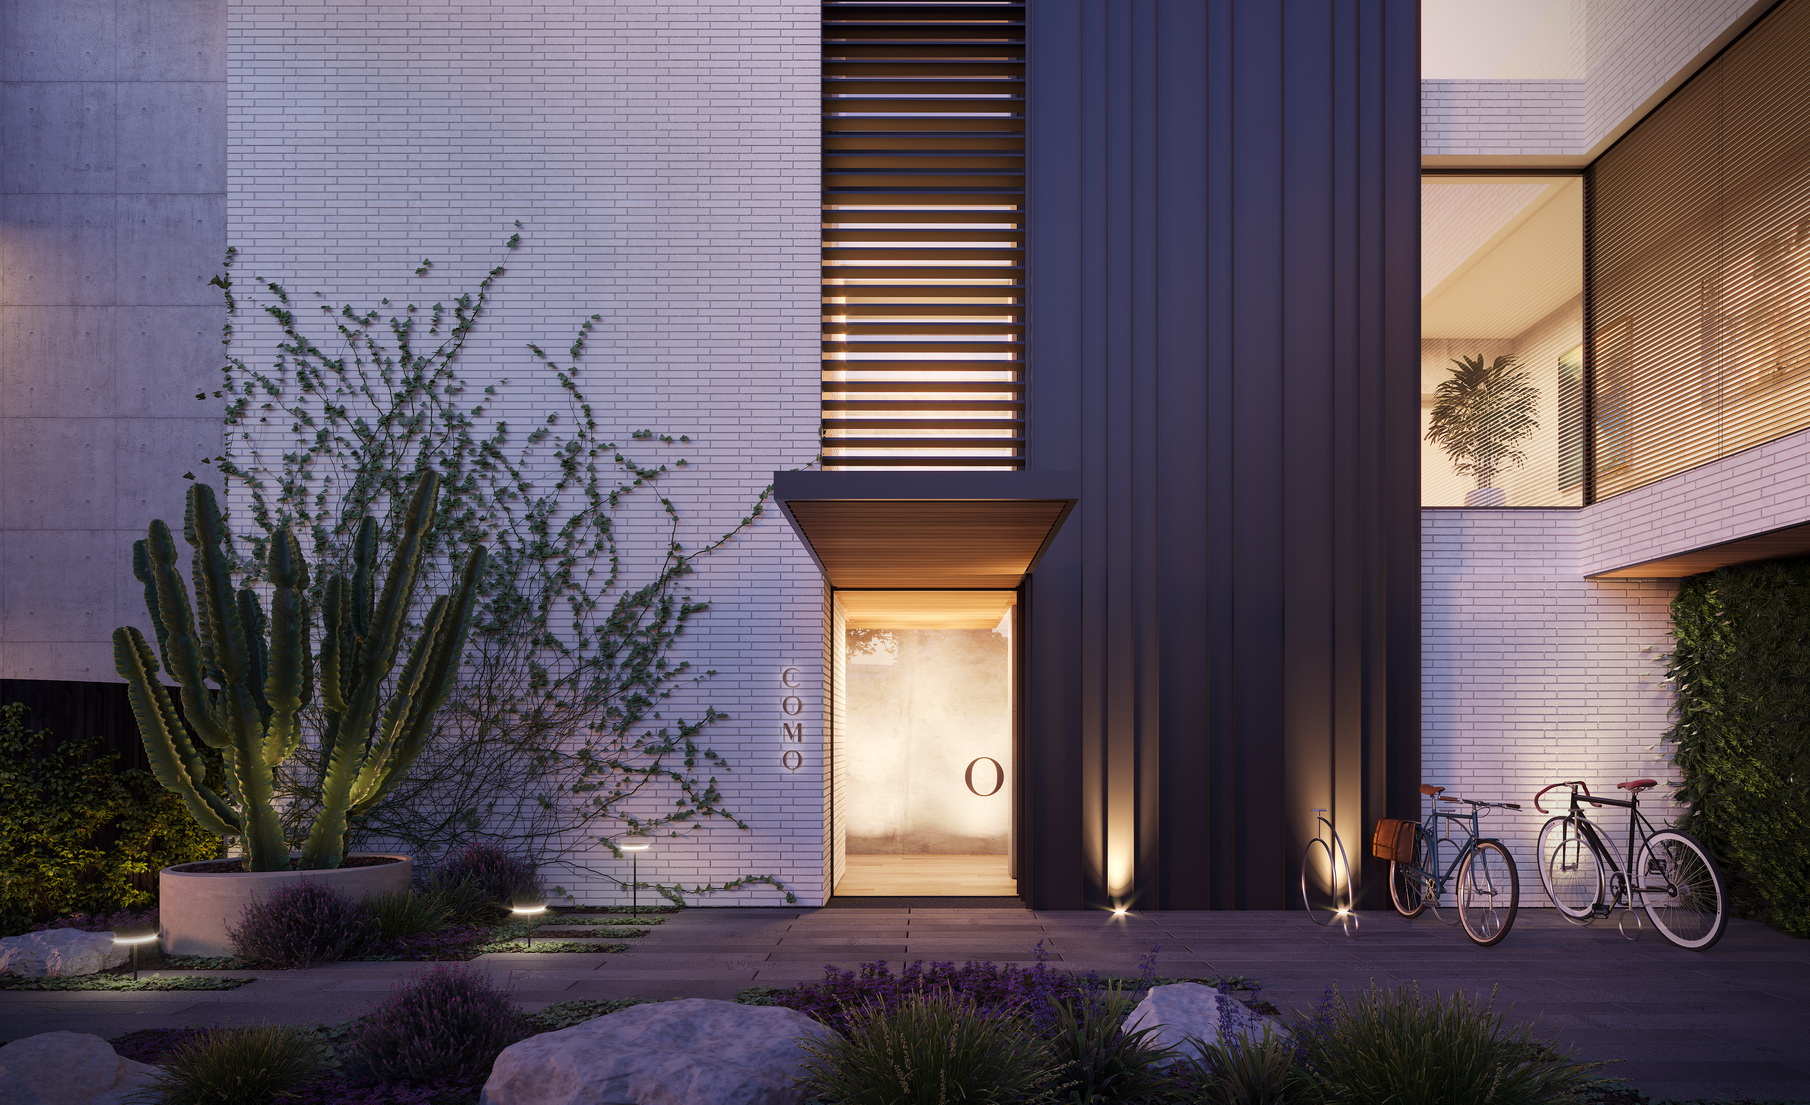 Como-Mckimm-3D-image-visualisation-exterior-detail-bricks